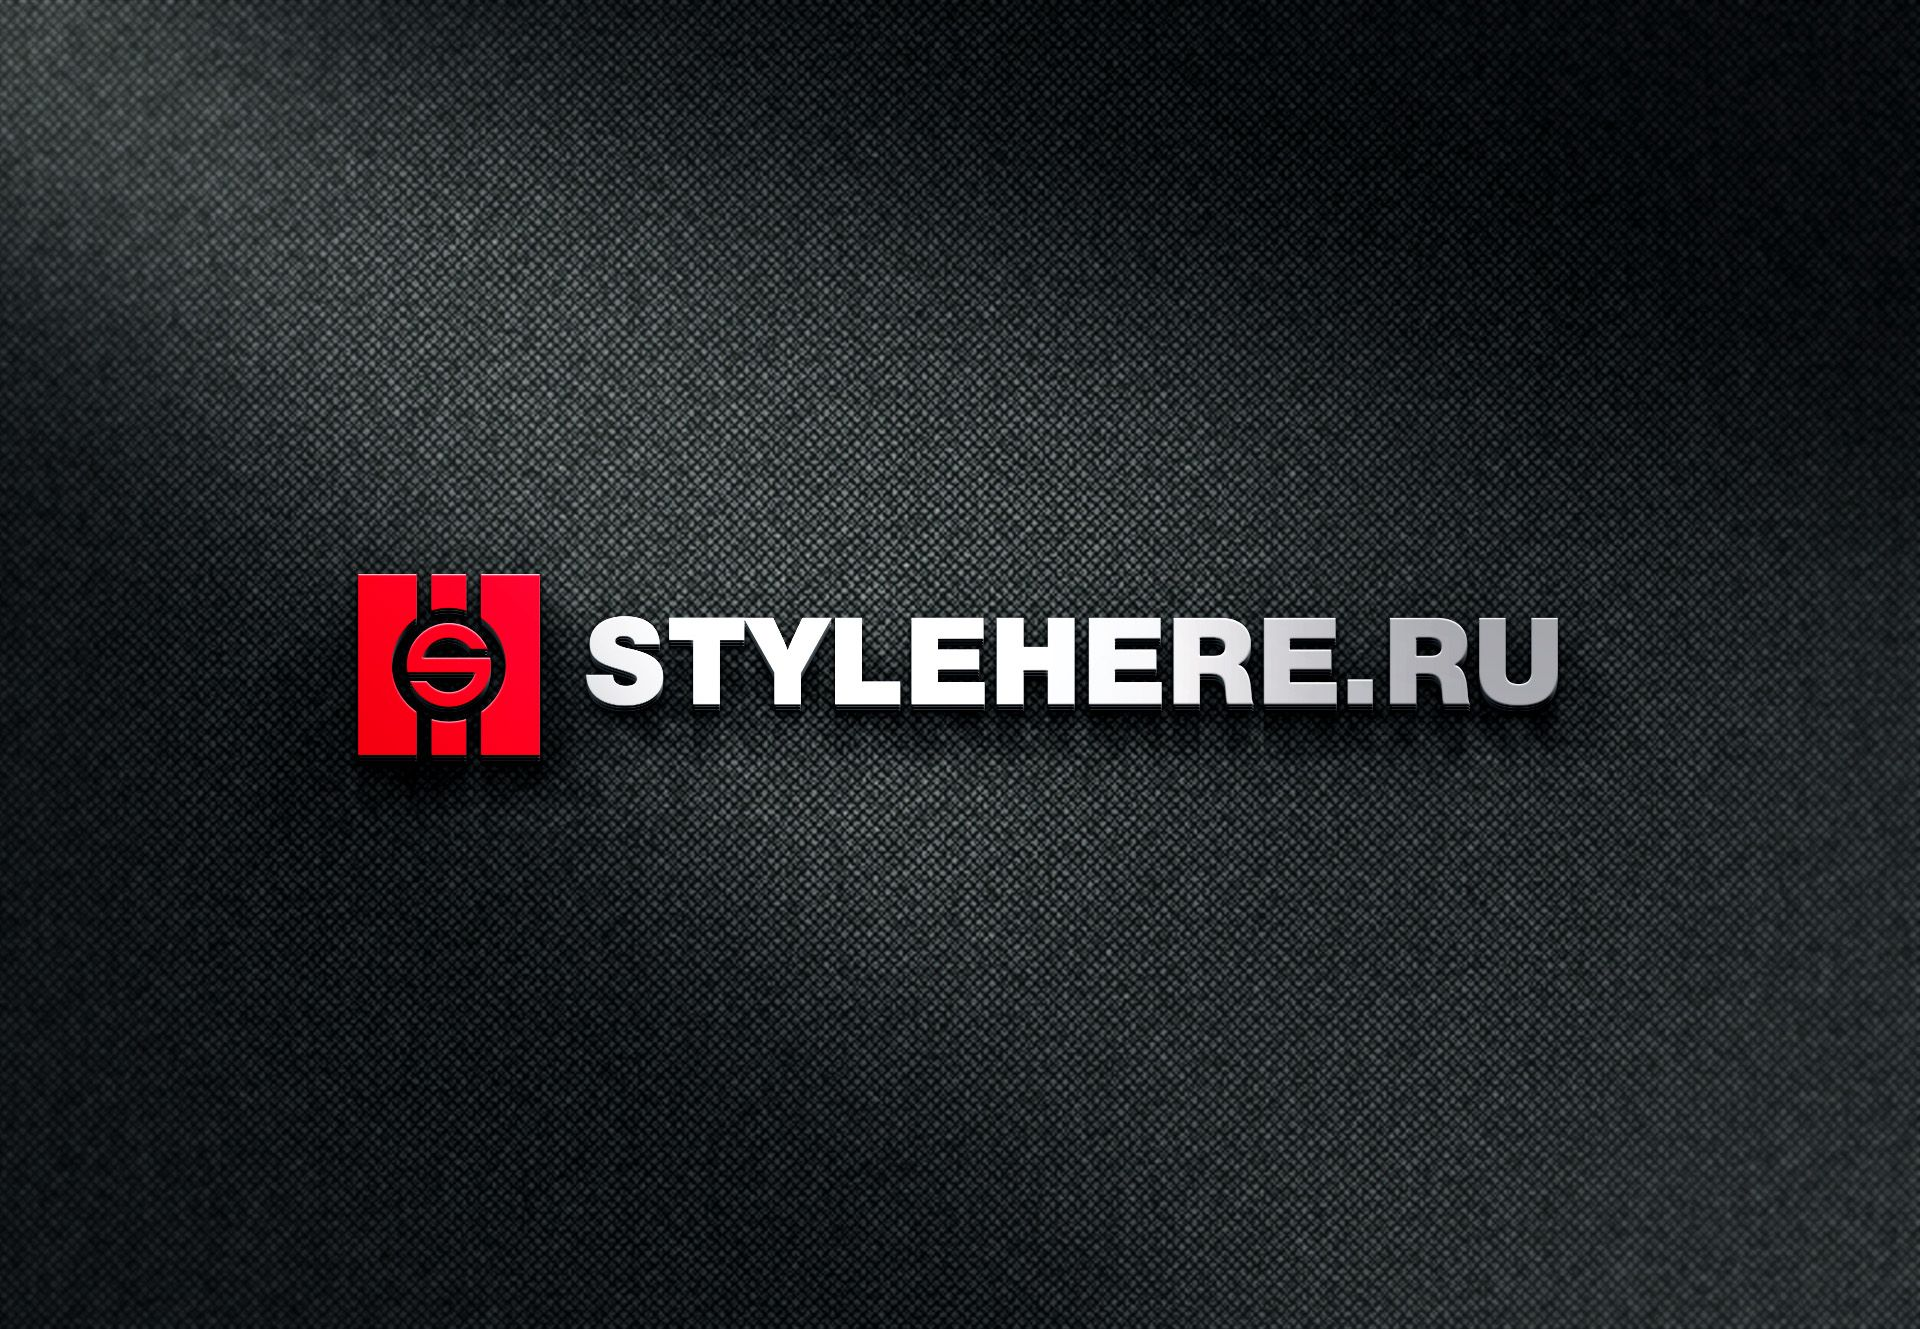 Логотип для интернет-магазина stylehere.ru - дизайнер alpine-gold